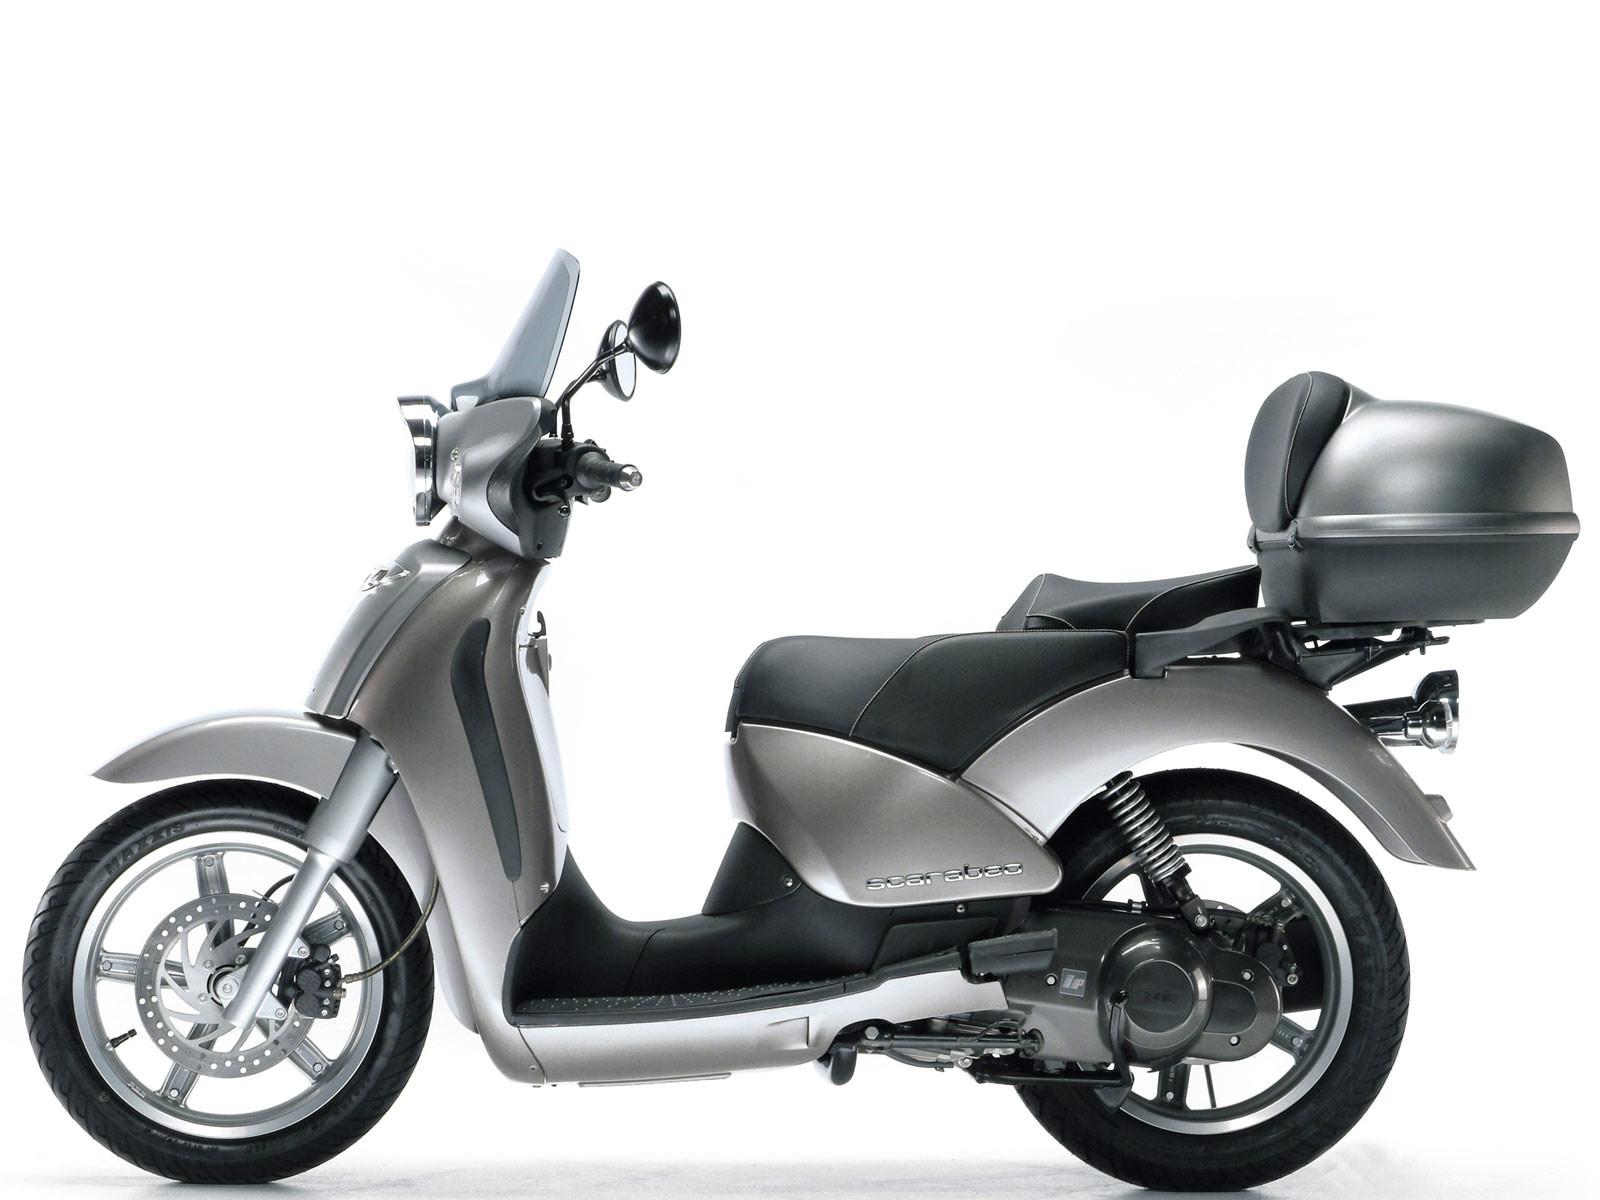 scooter insurance 2005 aprilia scarabeo 250 pictures. Black Bedroom Furniture Sets. Home Design Ideas